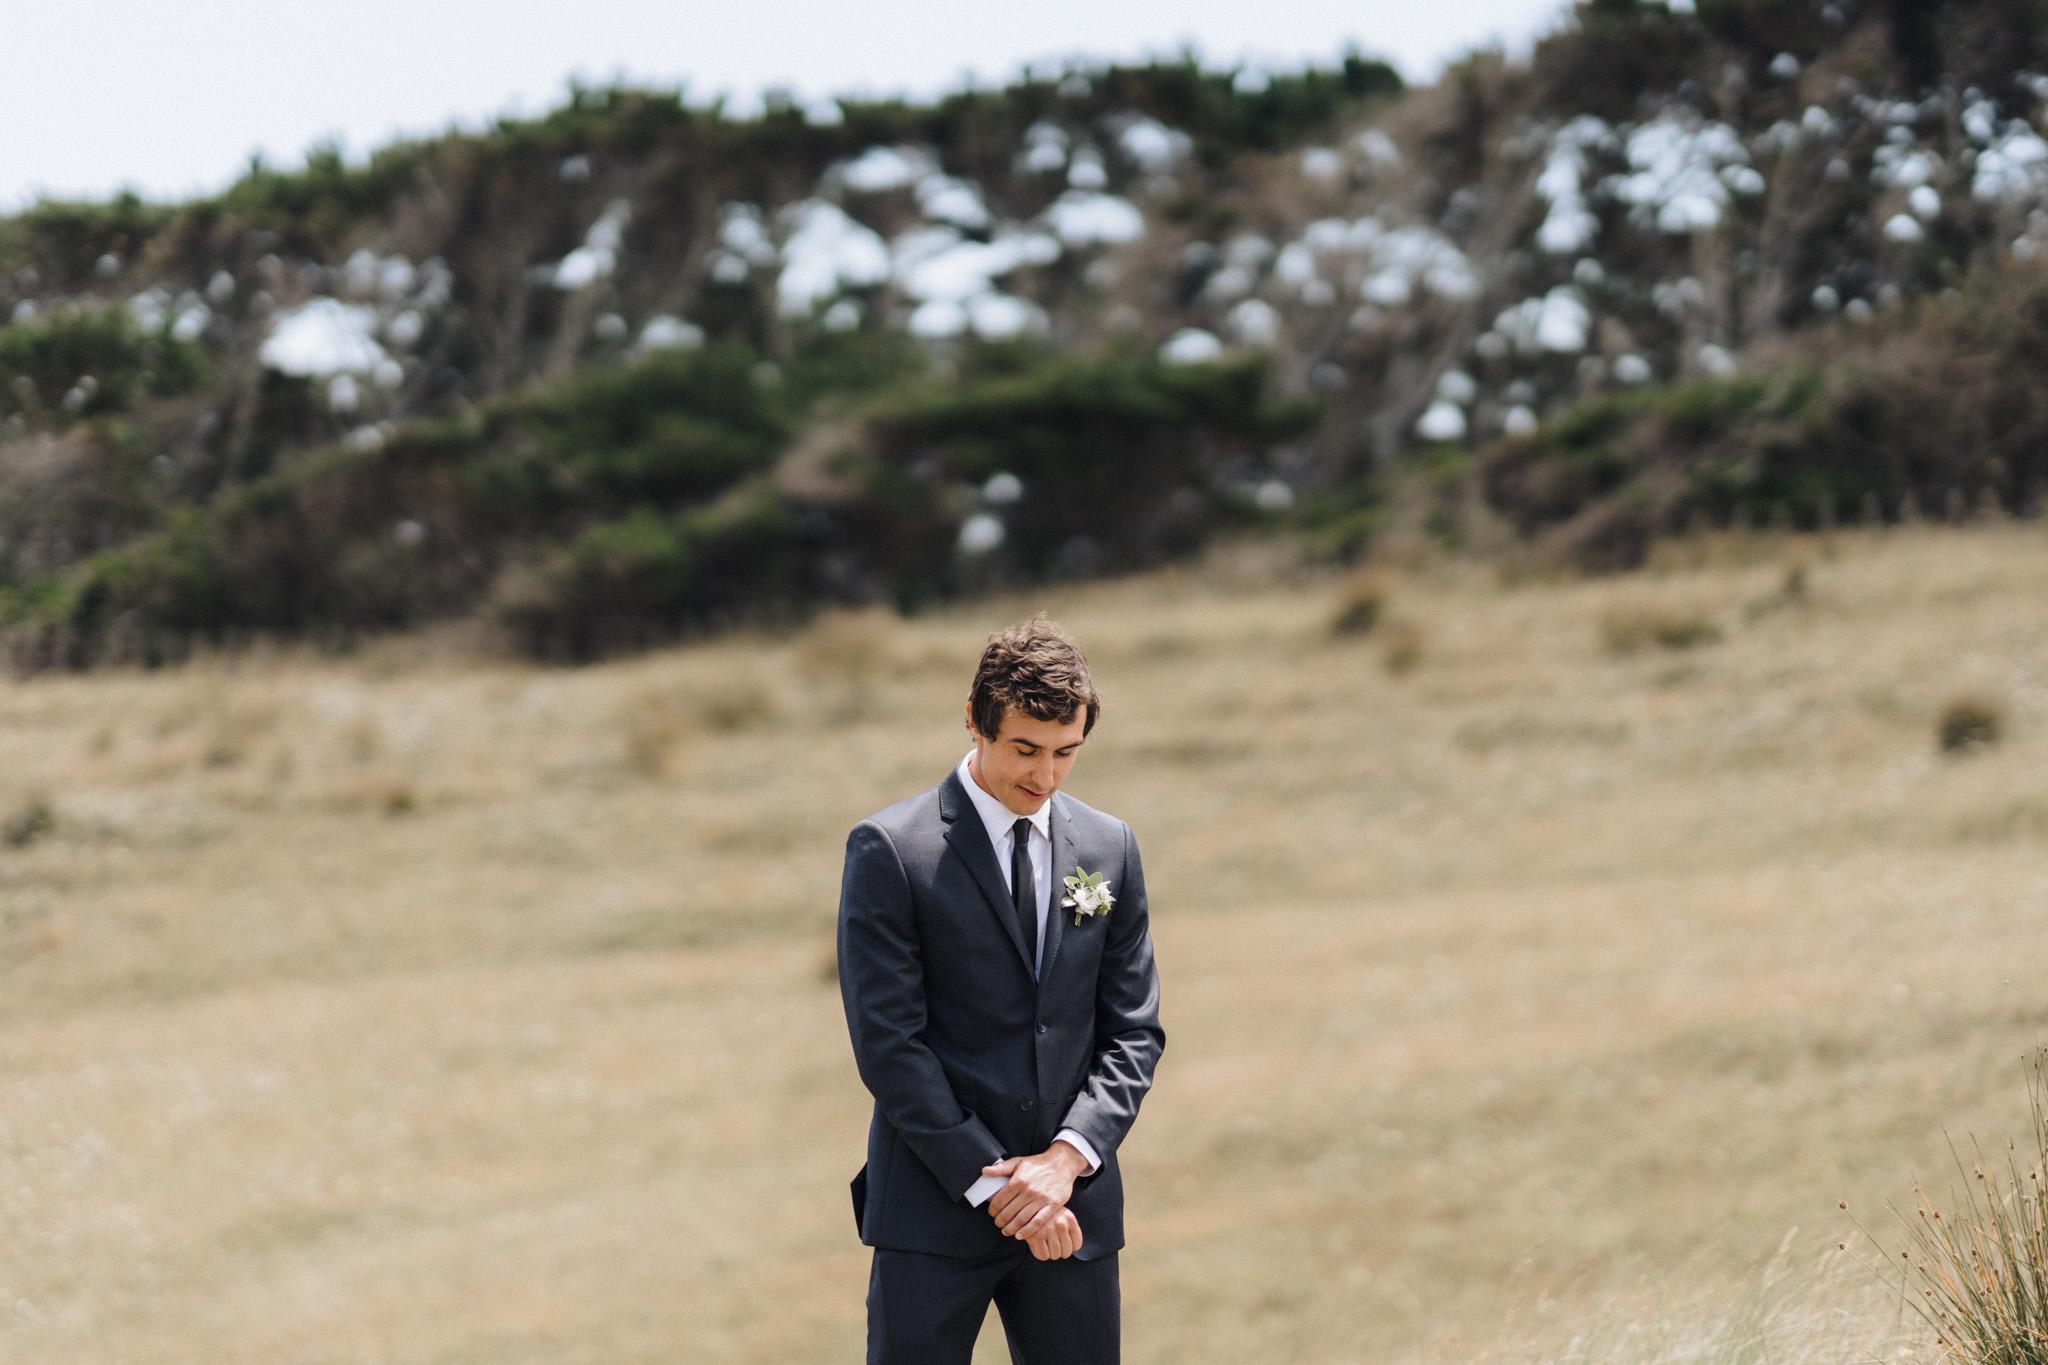 newfound-h-m-castaways-waiuku-auckland-wedding-photographer-22